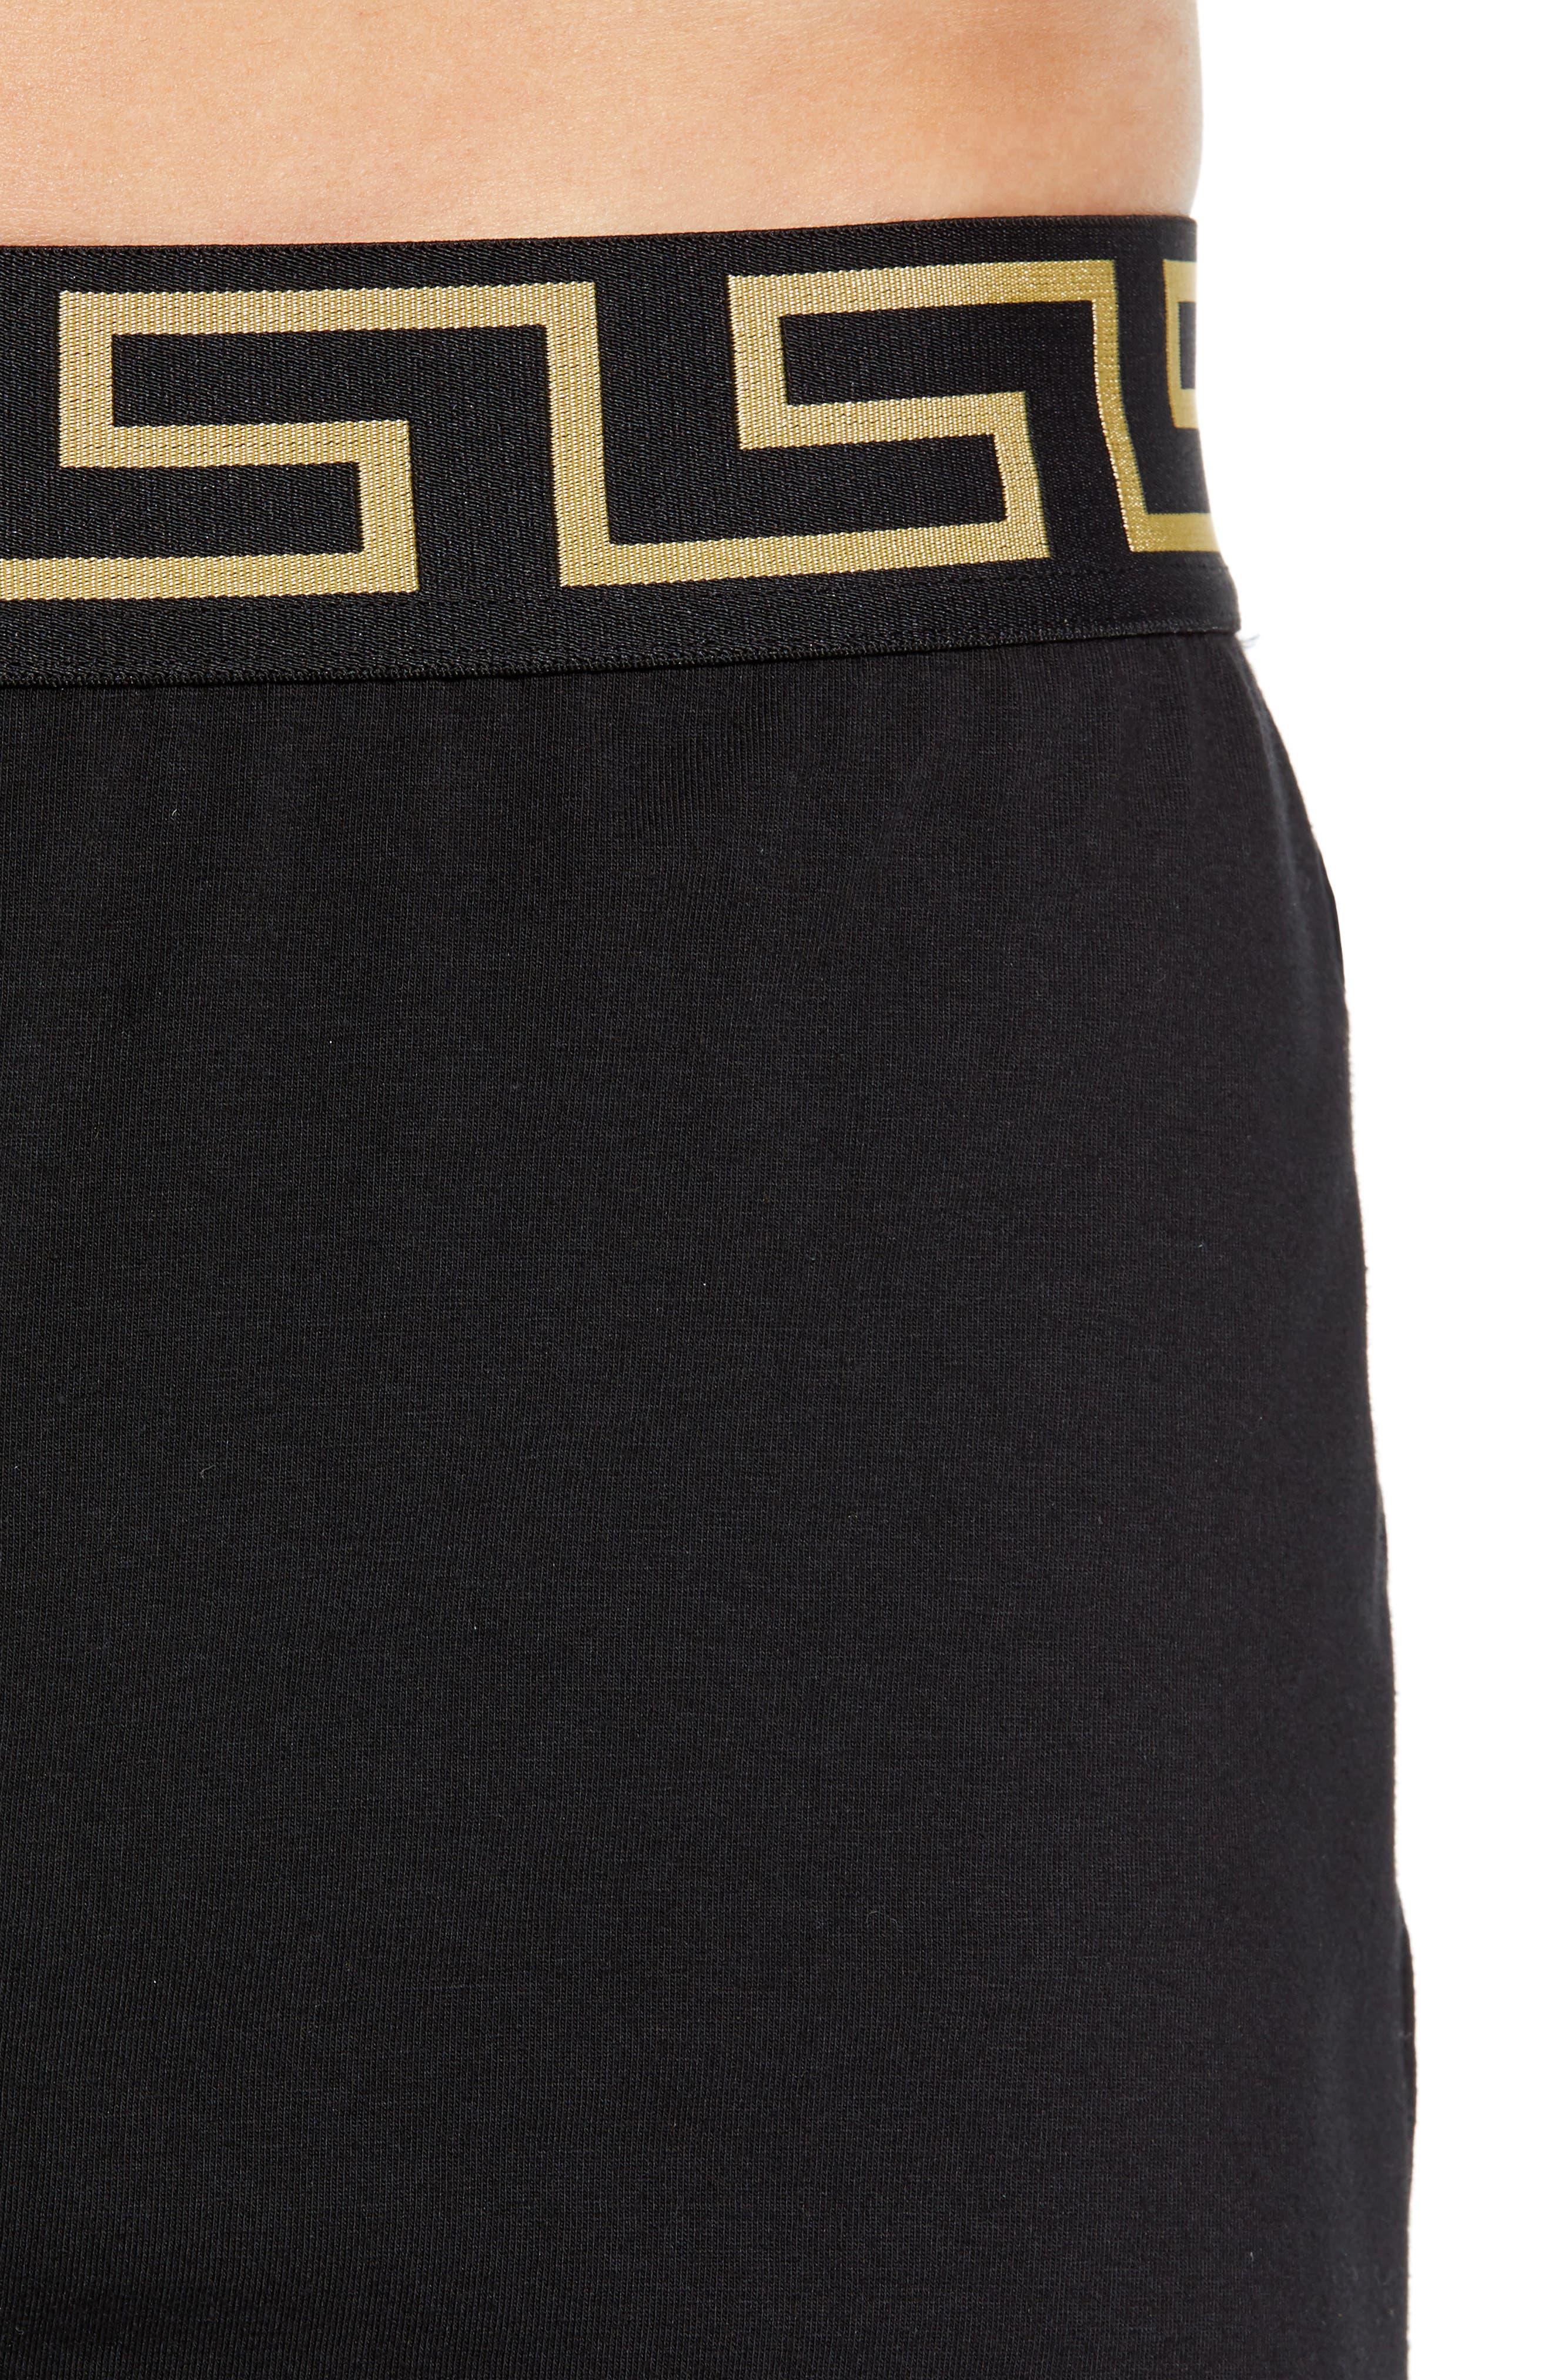 VERSACE, Intimo Uomo Boxers, Alternate thumbnail 4, color, BLACK/ GOLD